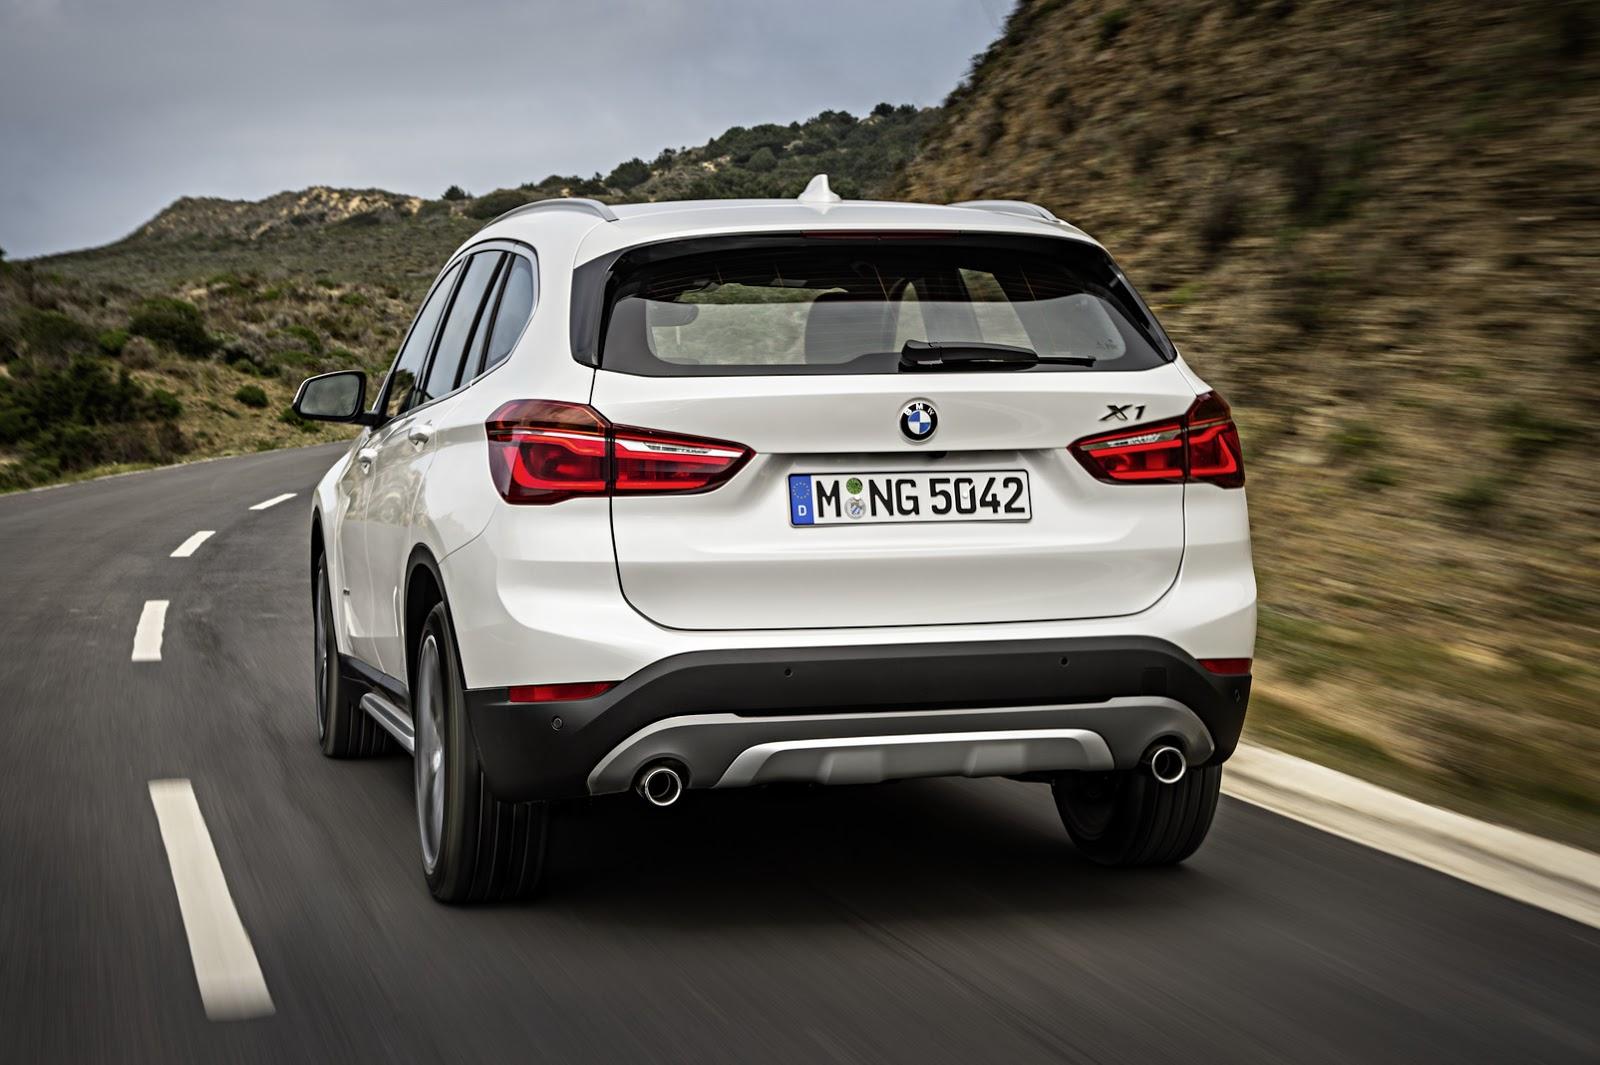 Nova BMW X1